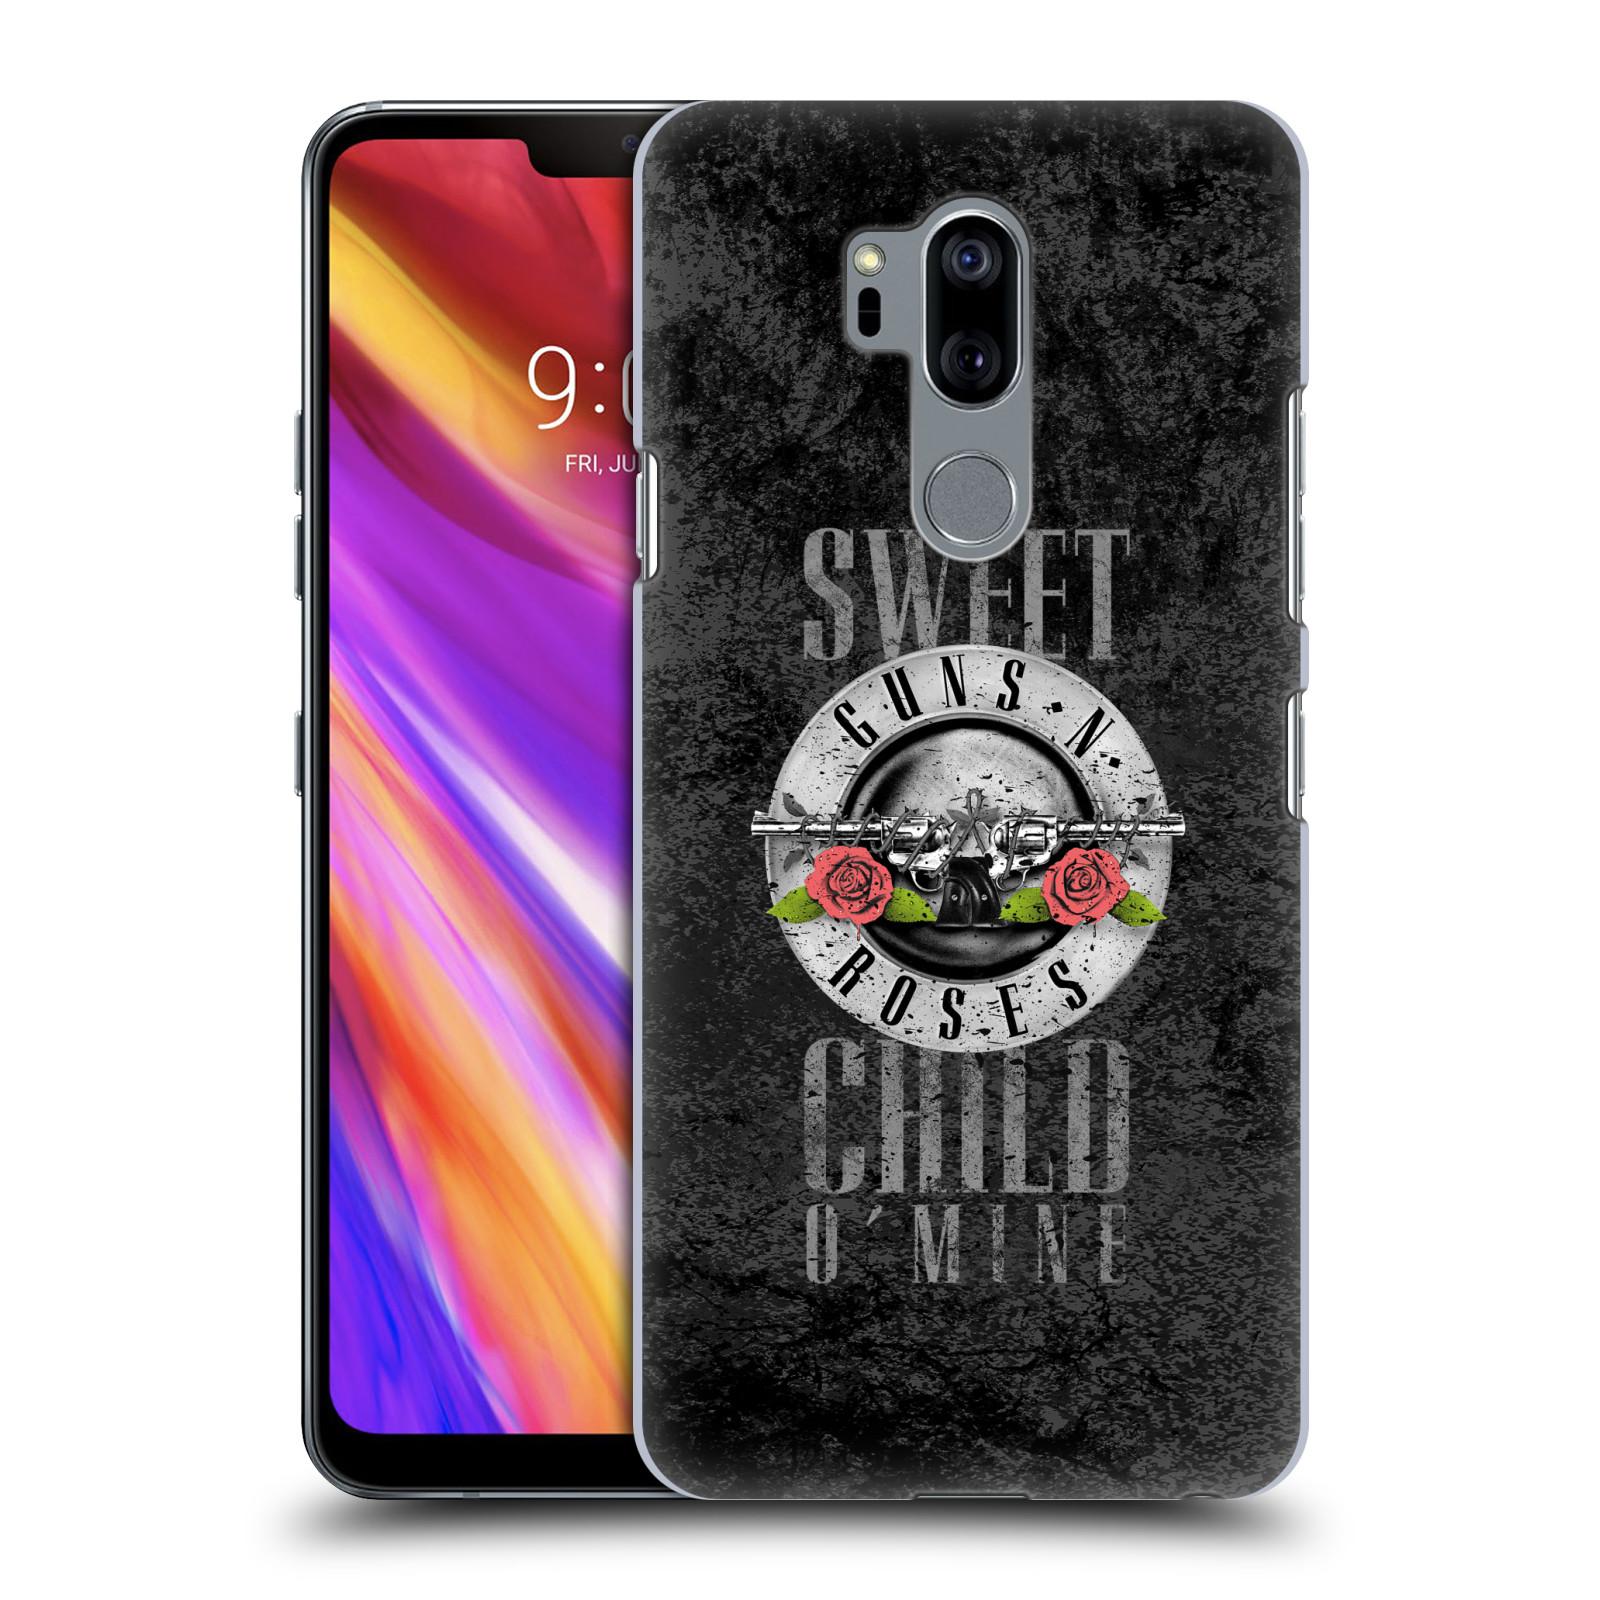 Plastové pouzdro na mobil LG G7 ThinQ - Head Case - Guns N' Roses - Sweet Child